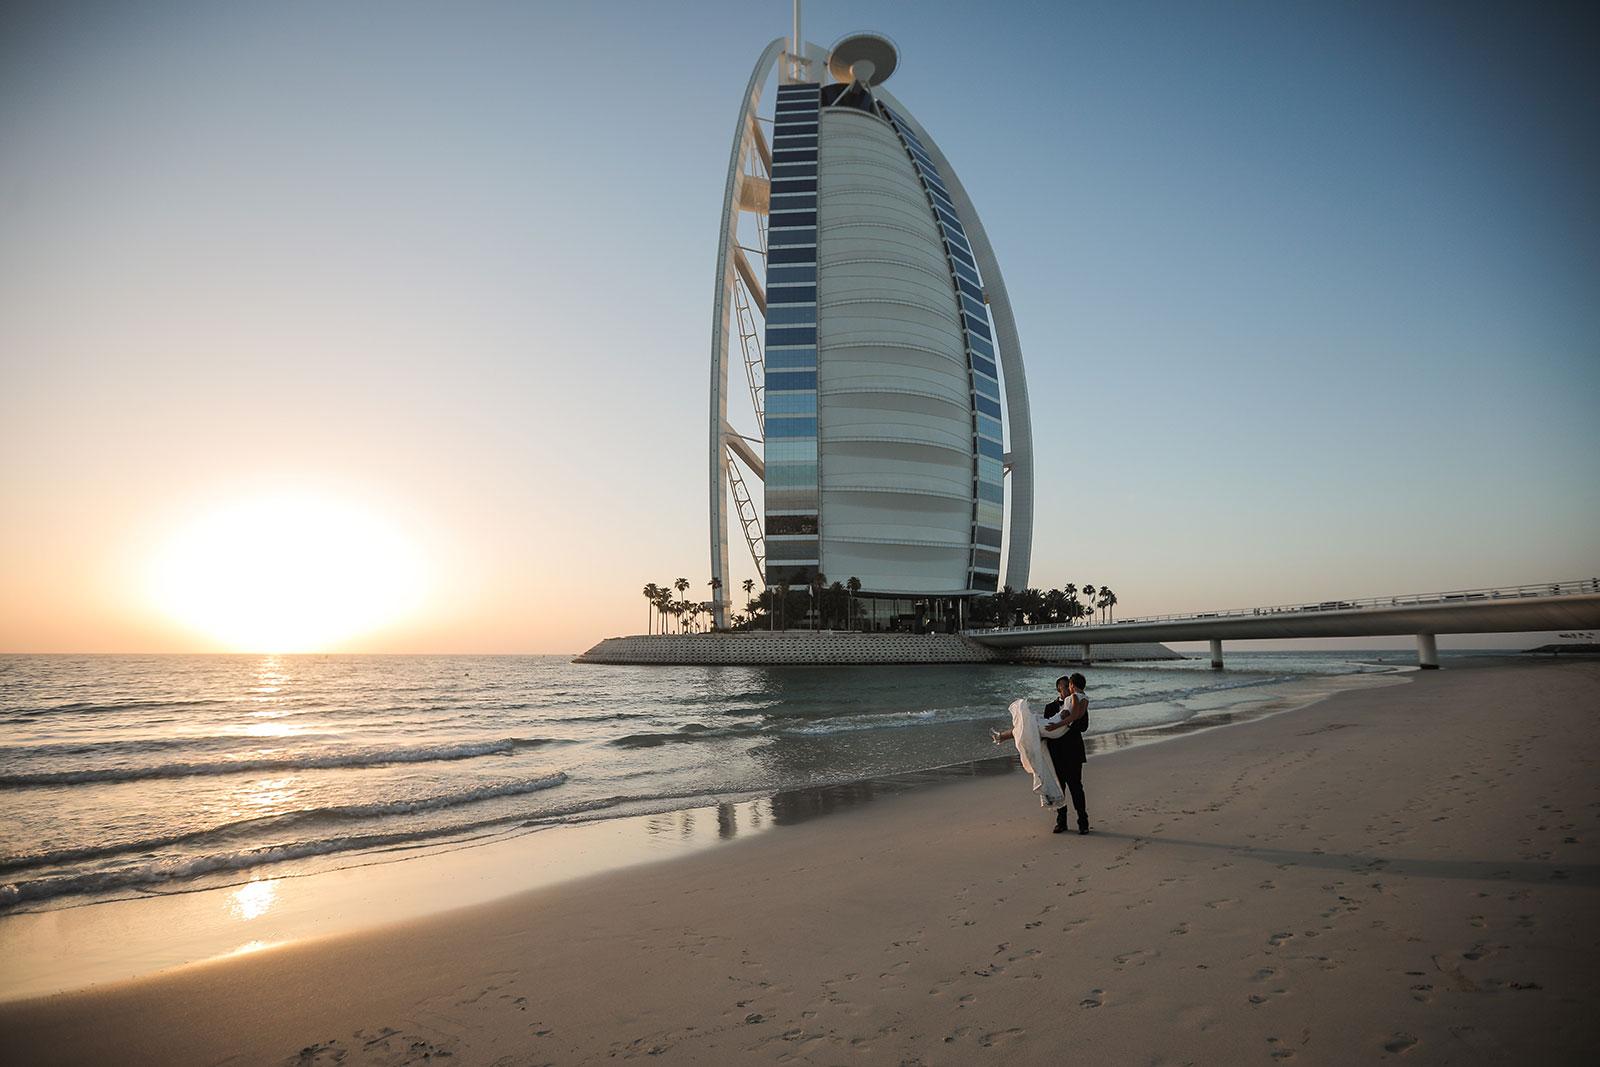 Dubai UAE Wedding Photographer - The MelRish Studio